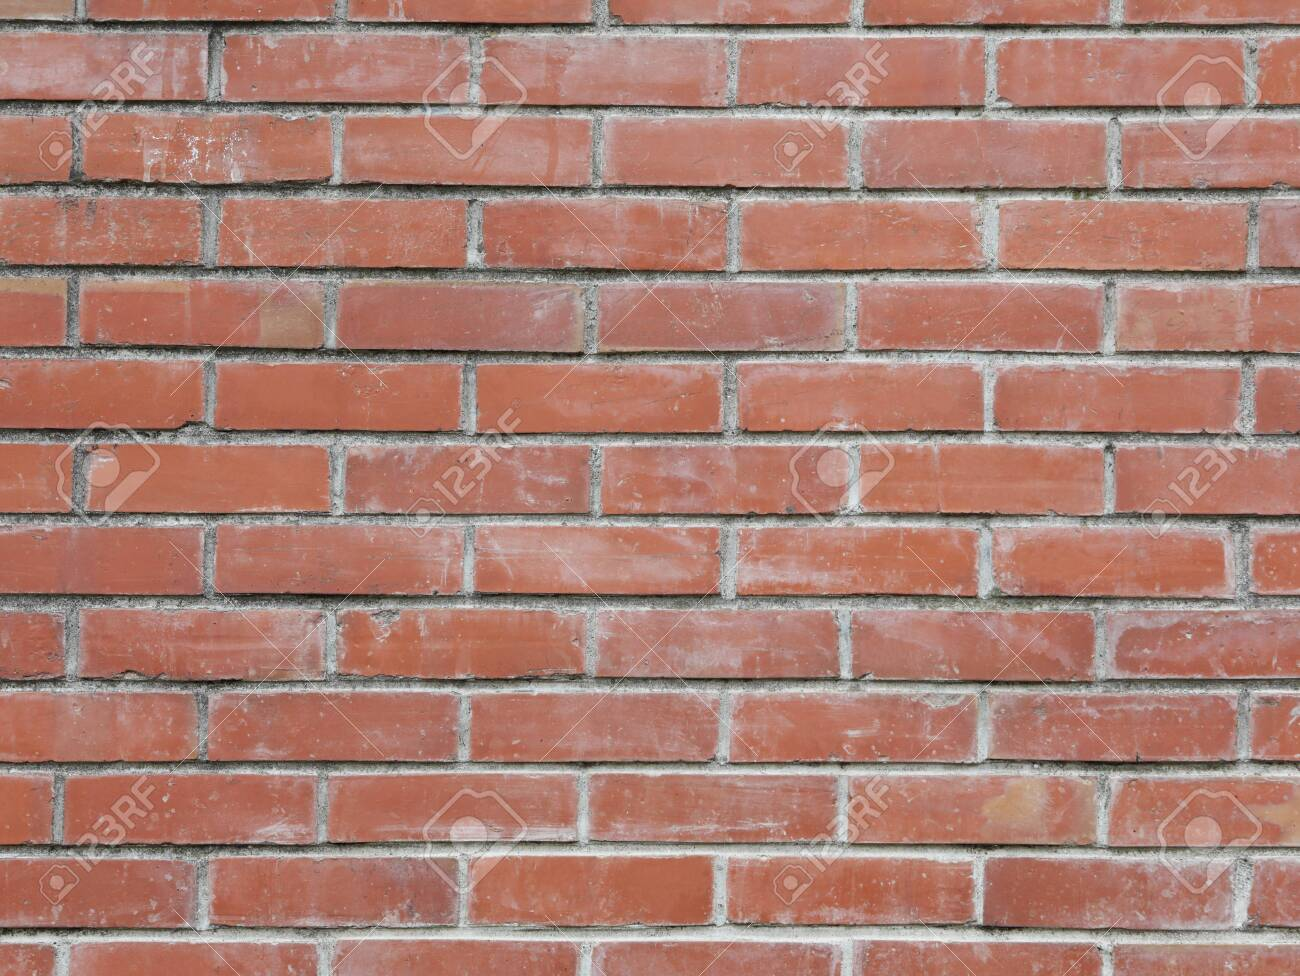 brick wall background - 129192655